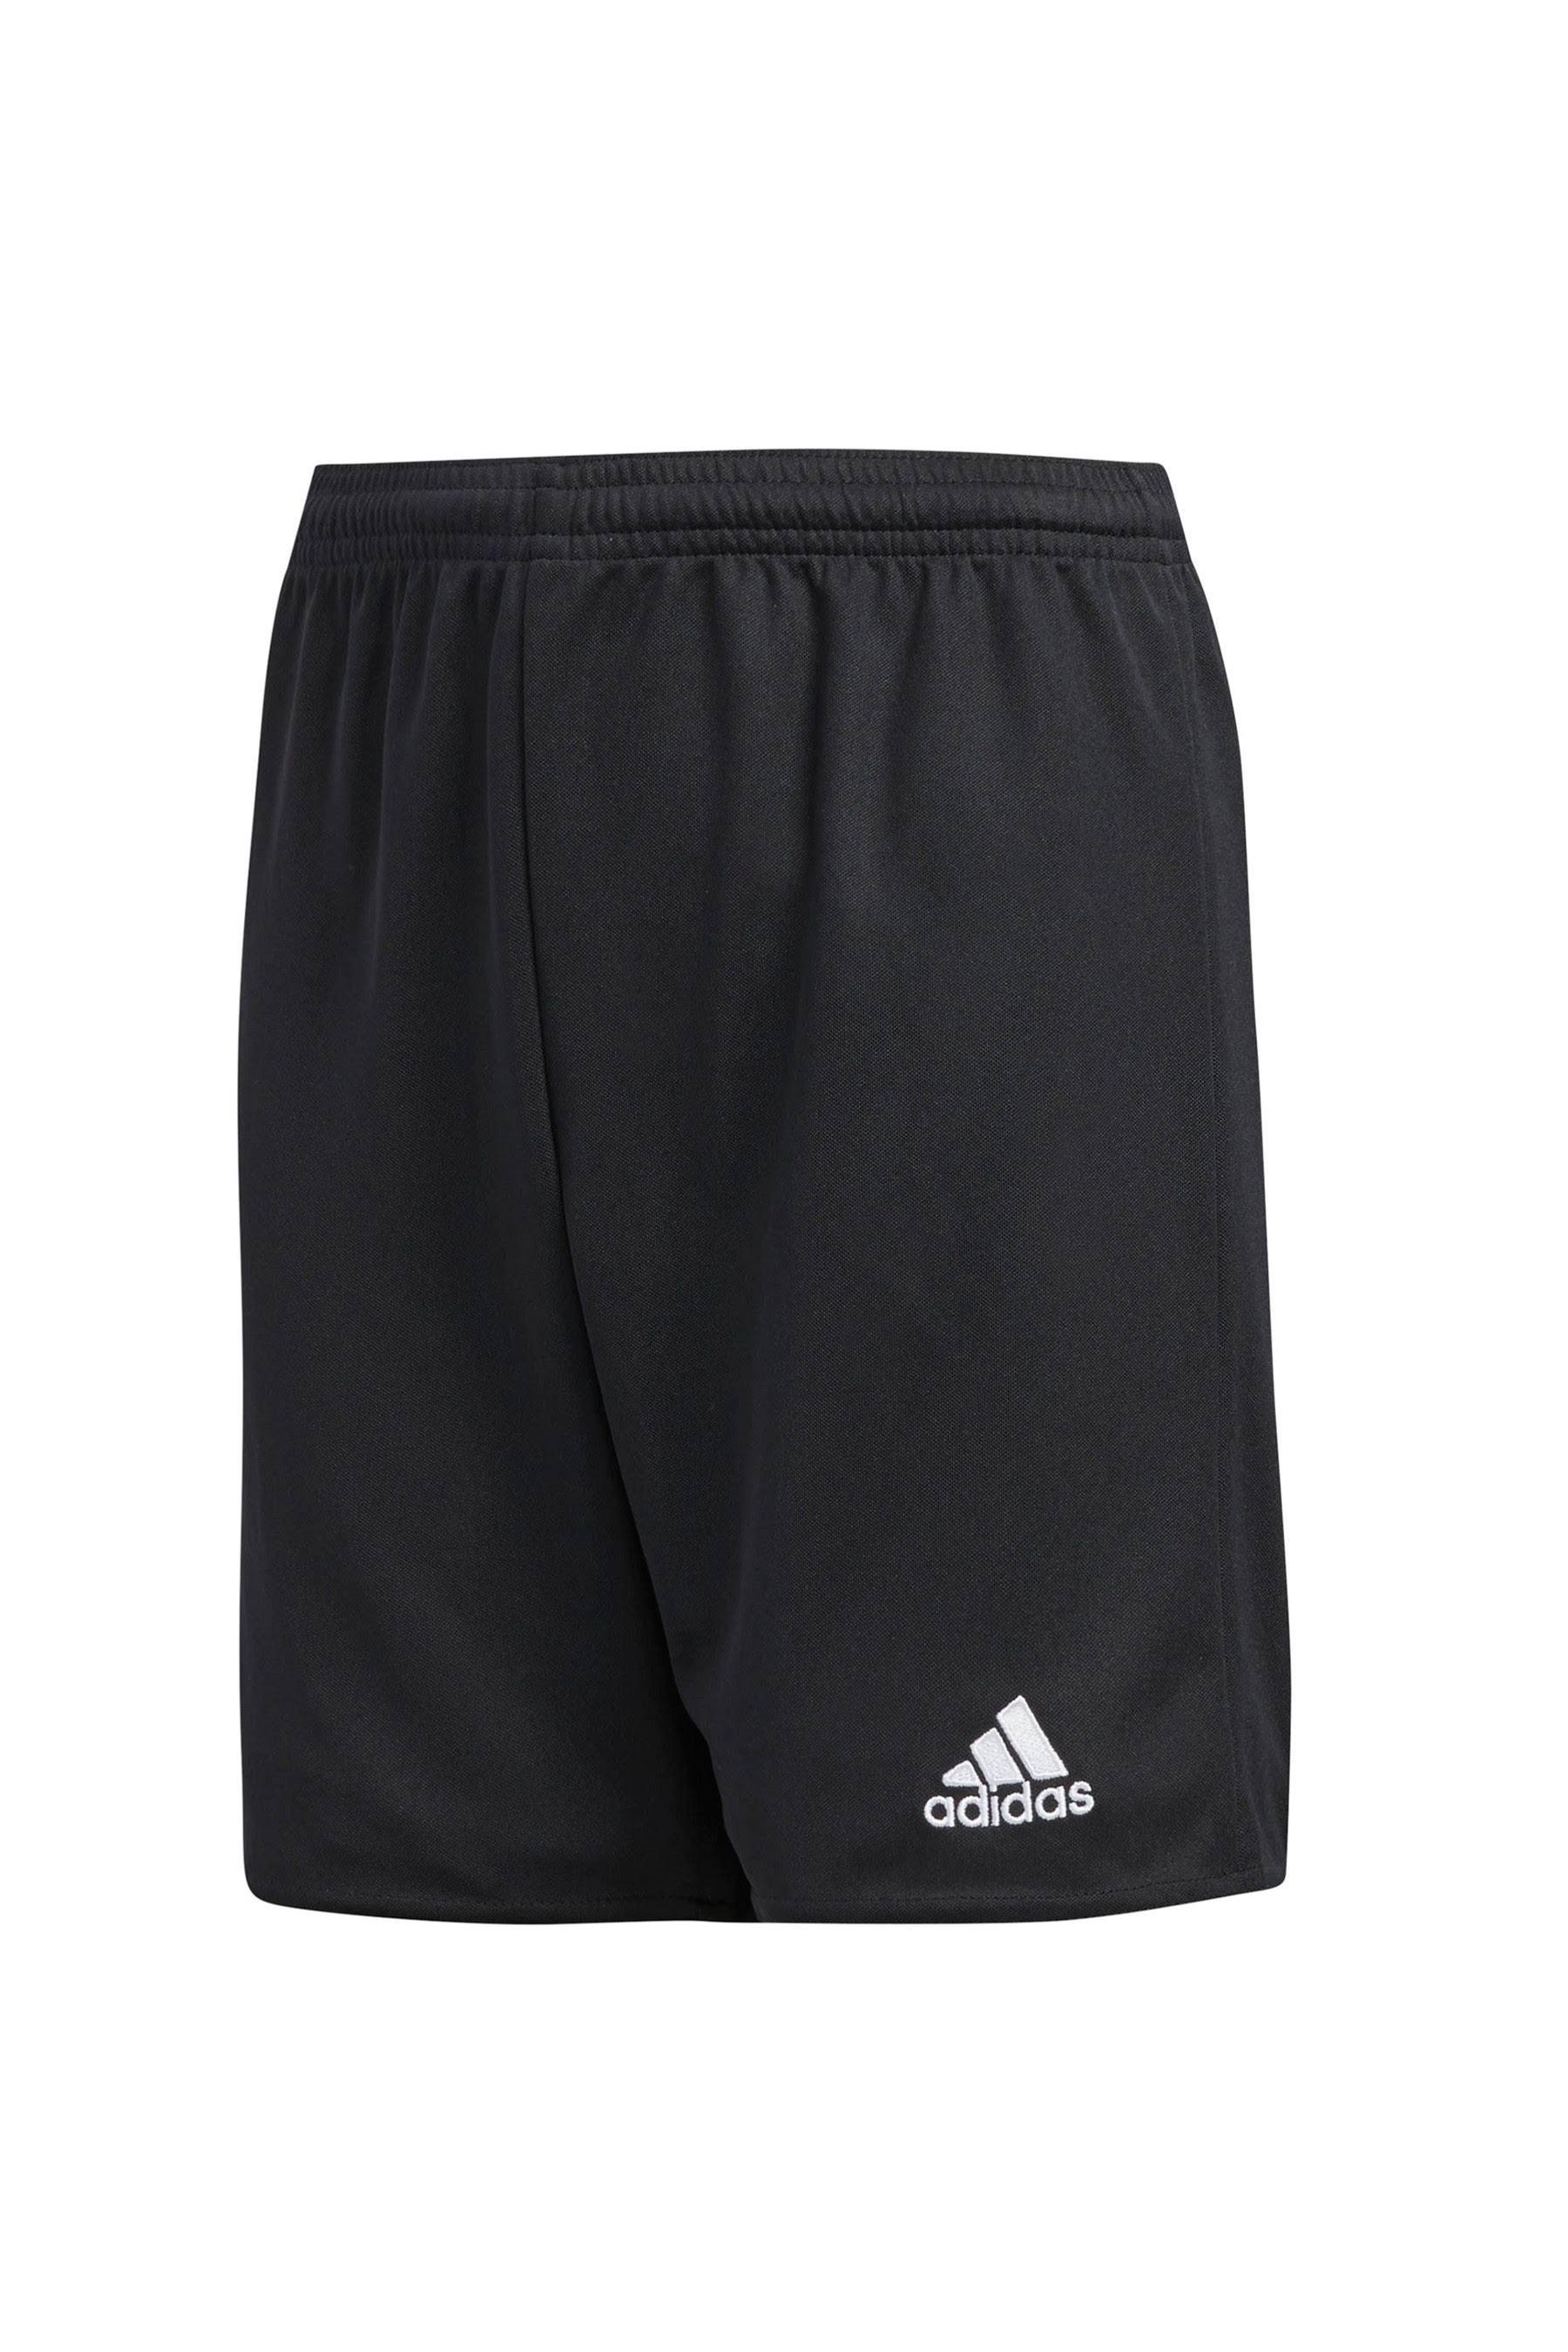 Adidas Shorts Parma 16 - Black/White Kids